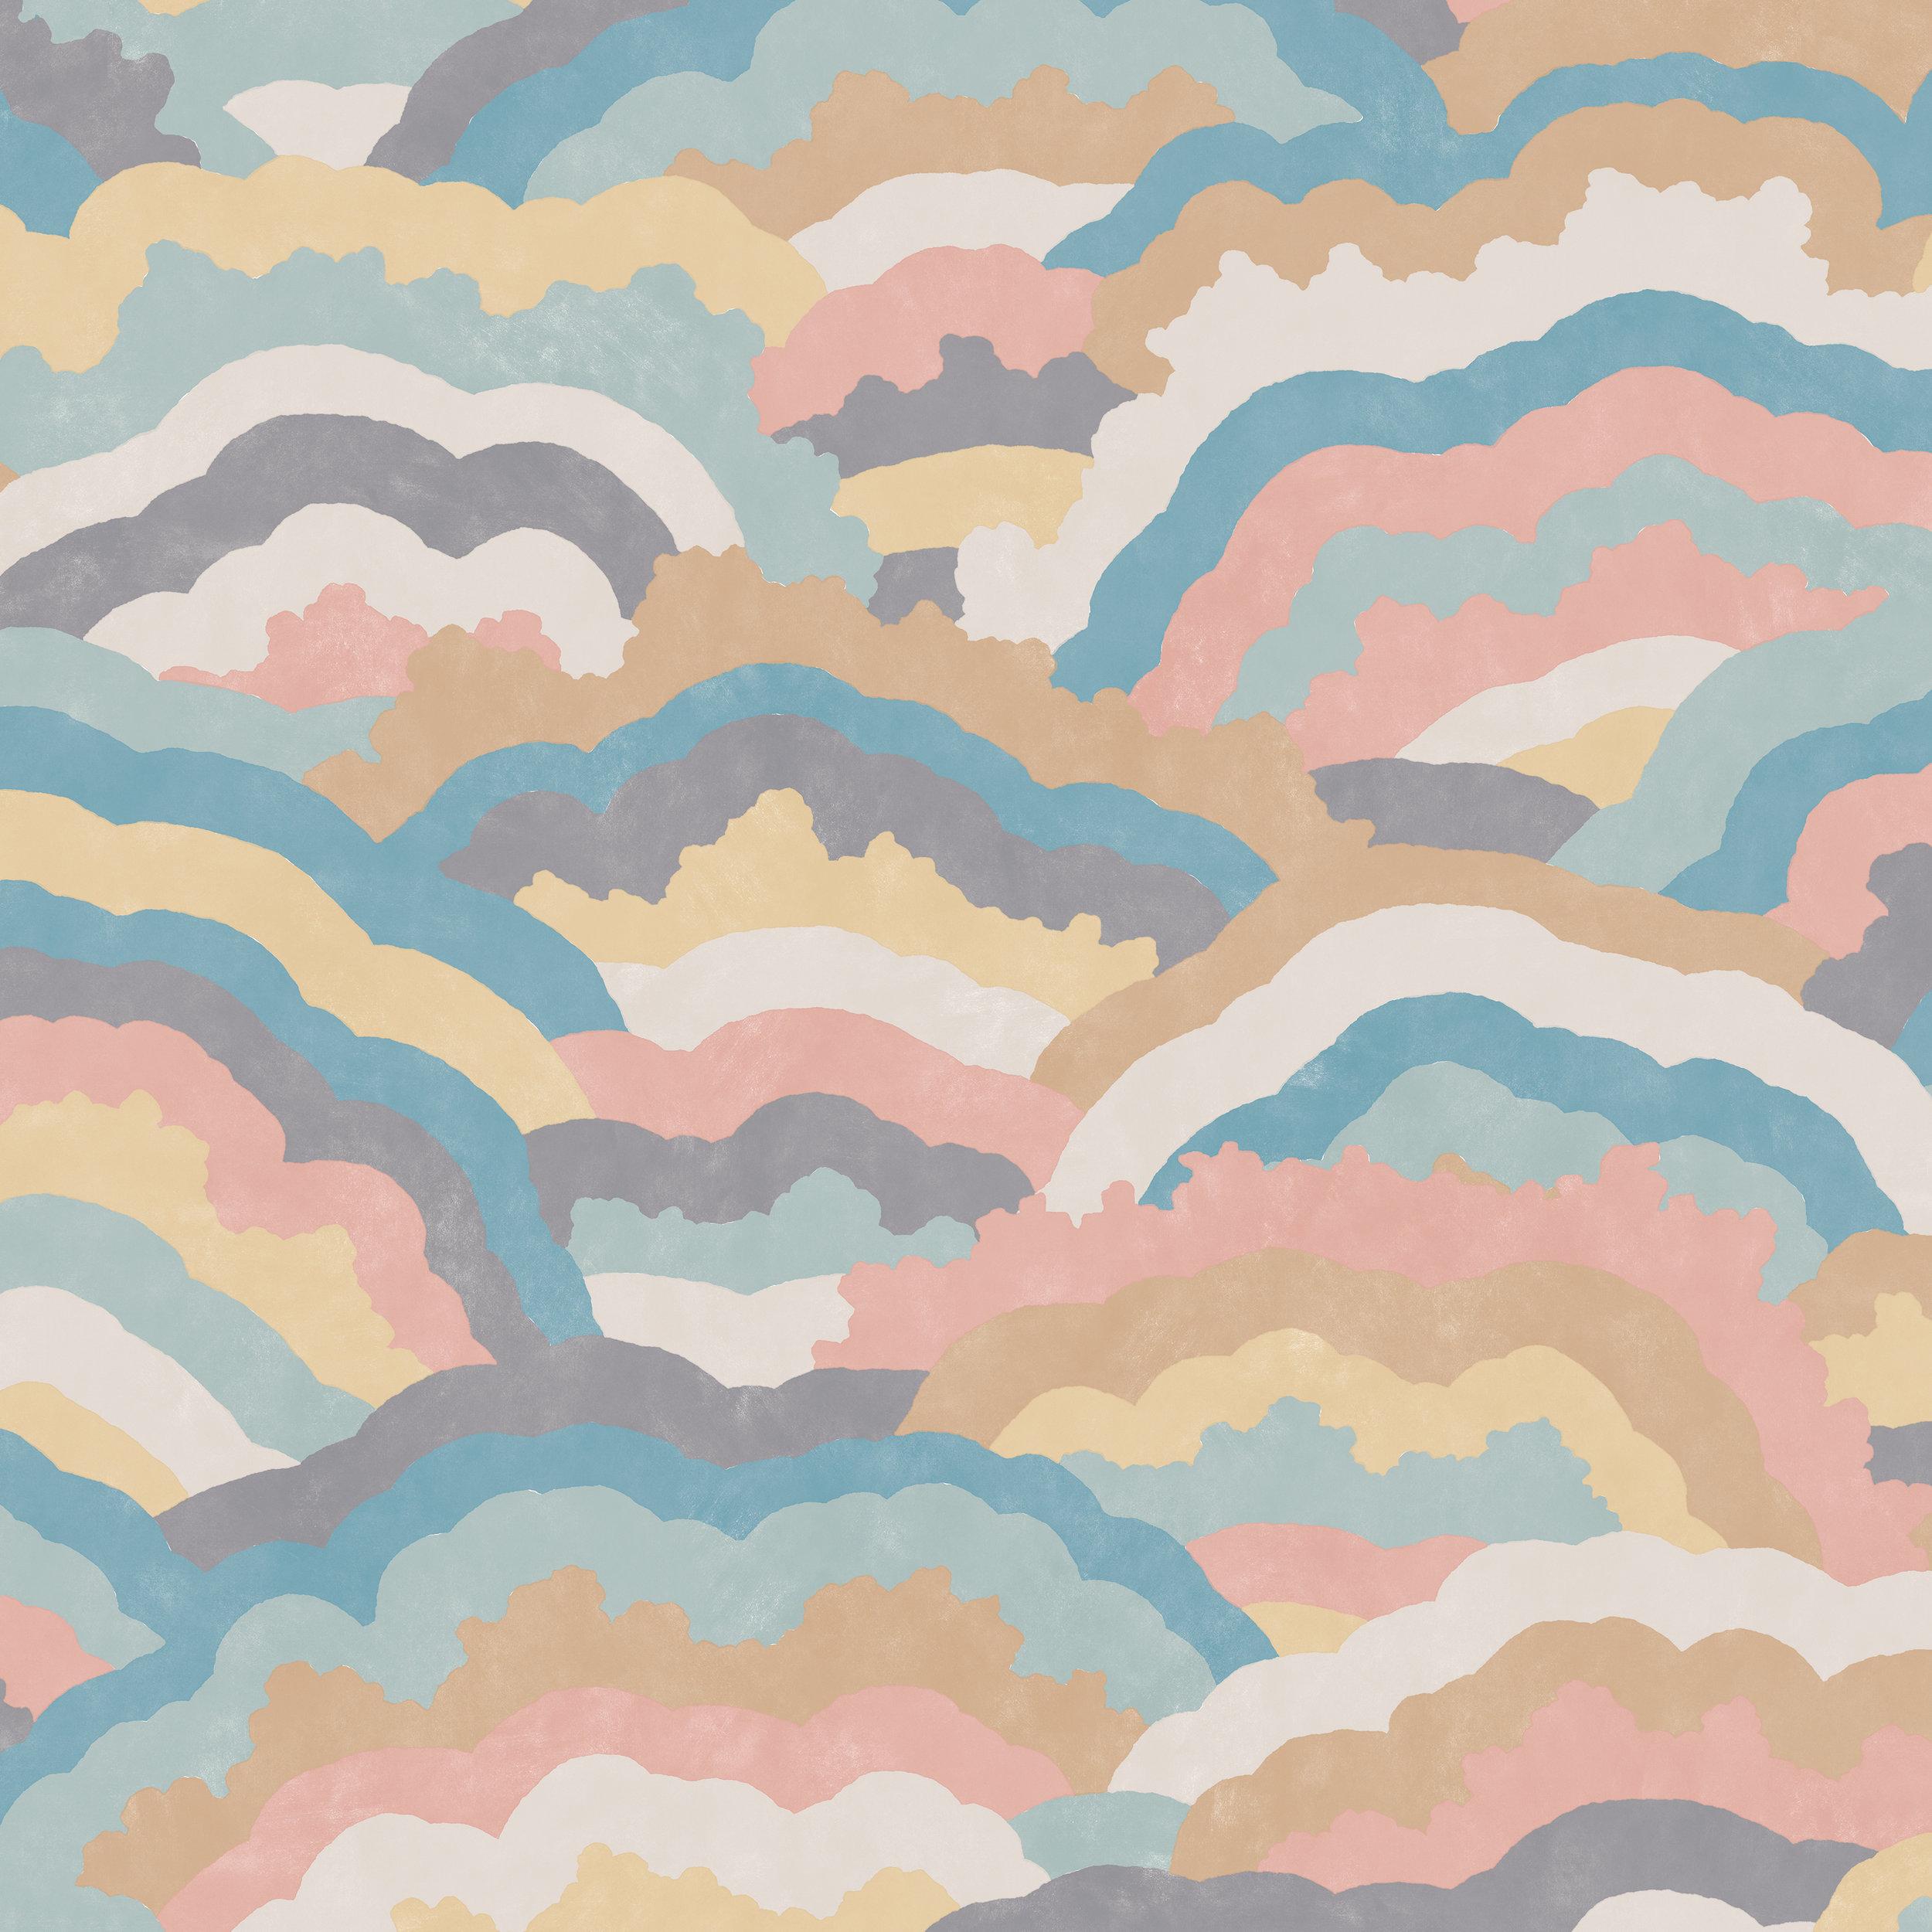 Dreamhouse_Colorway12_detail_WEB.jpg